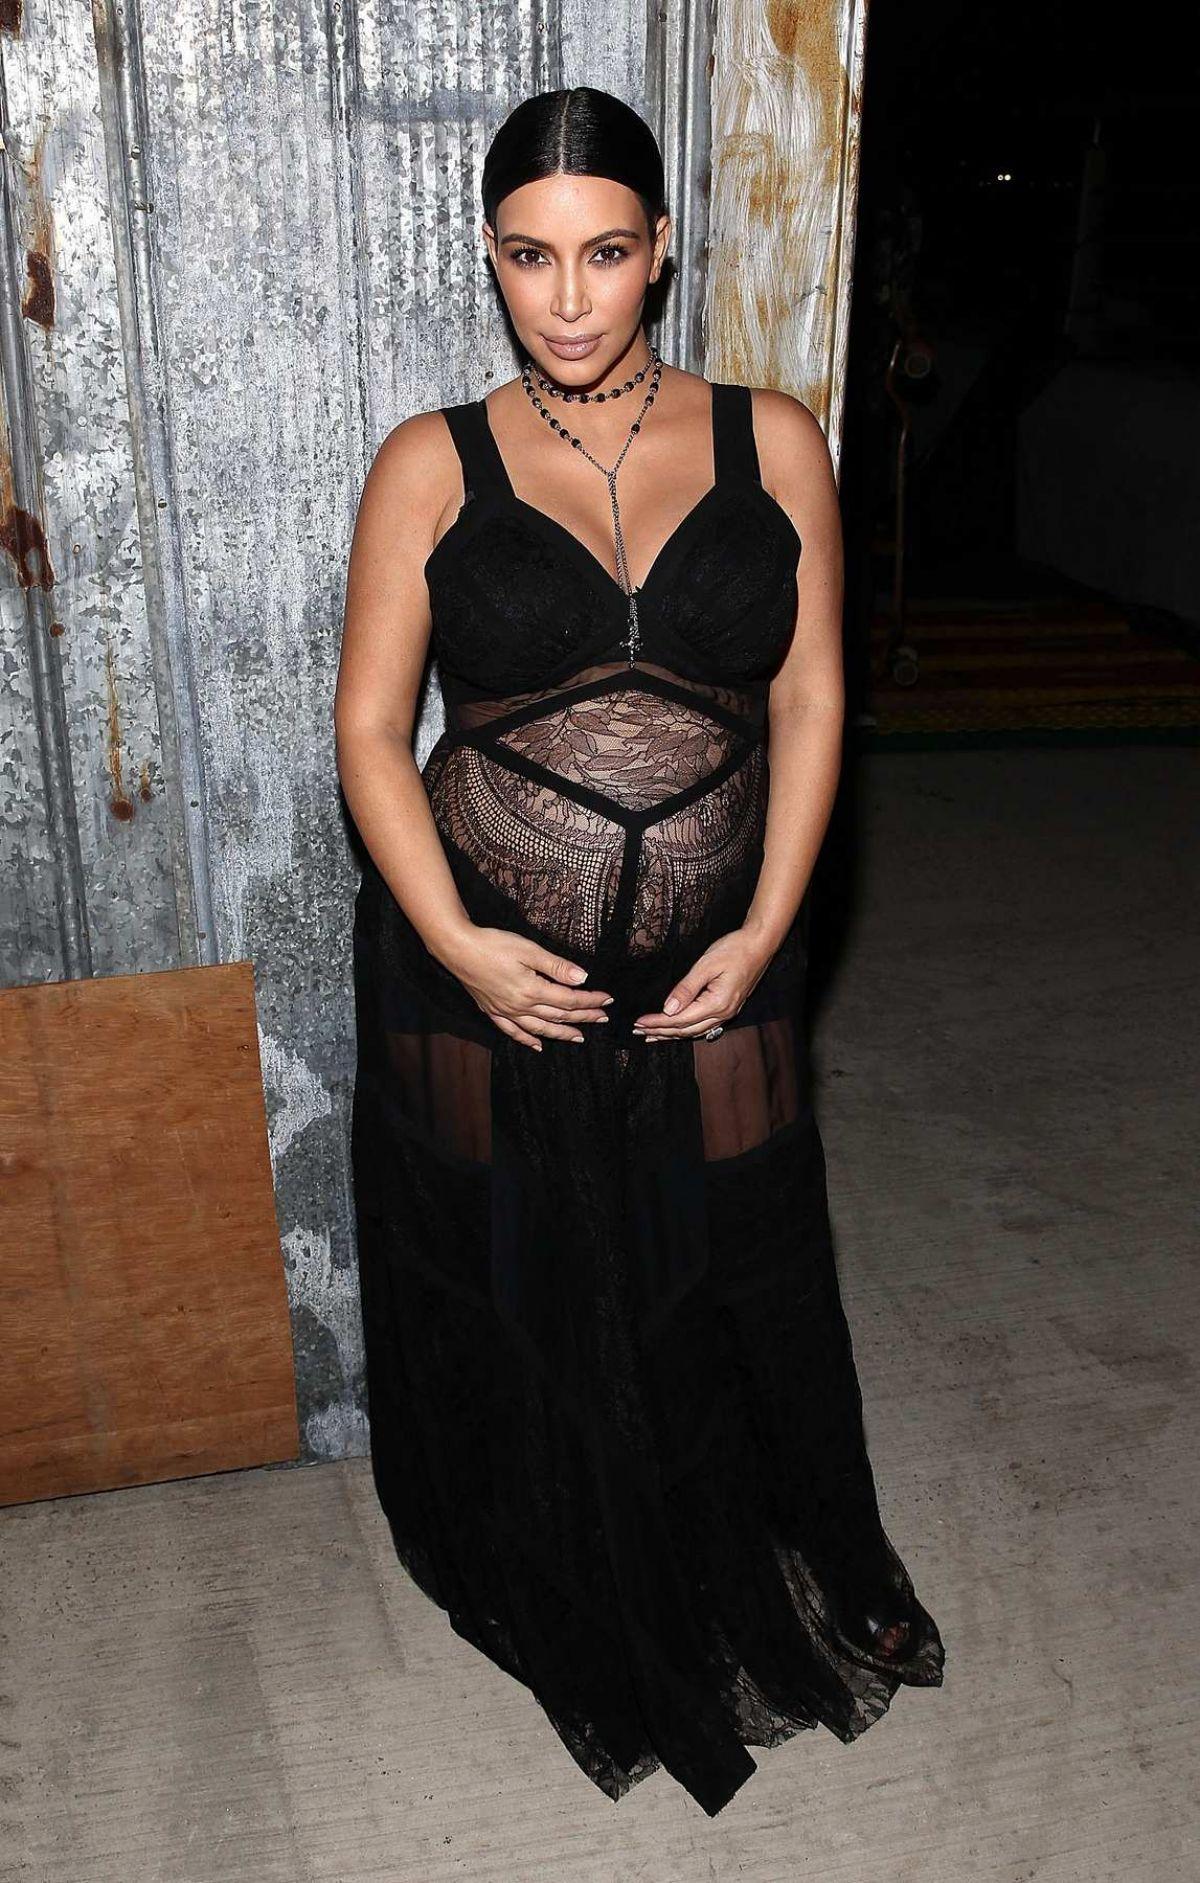 Pregnant Kim Kardashian At Givenchy Fashion Show In New York 09 11 2015 Hawtcelebs